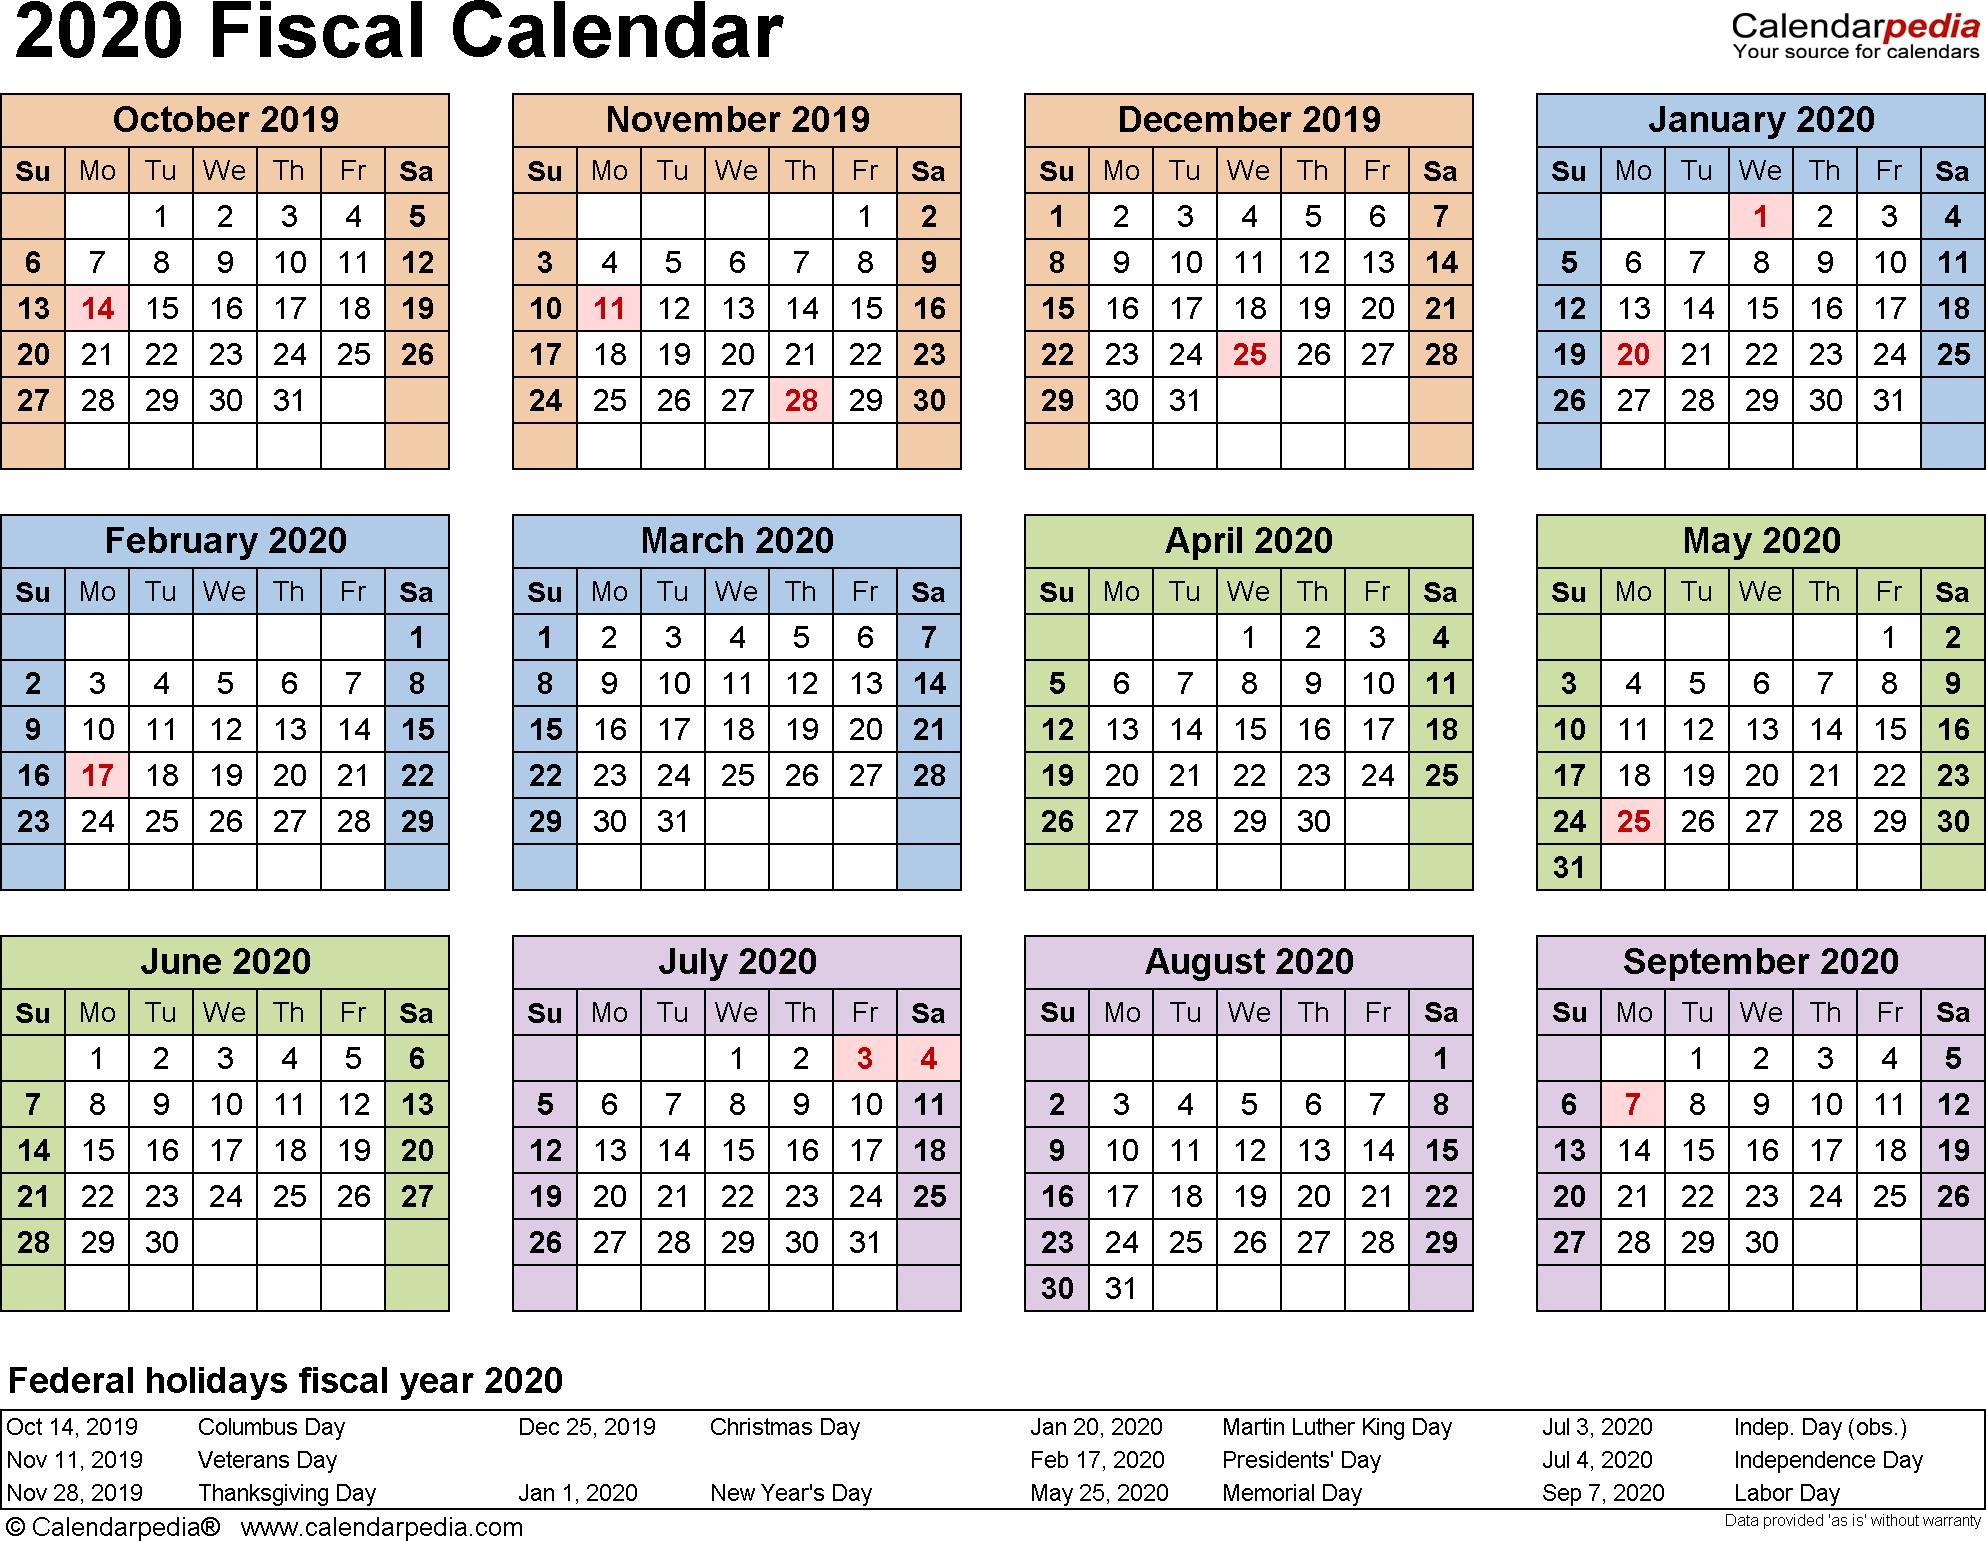 Fiscal Calendars 2020 As Free Printable Pdf Templates 2020 Holiday Calendar Federal